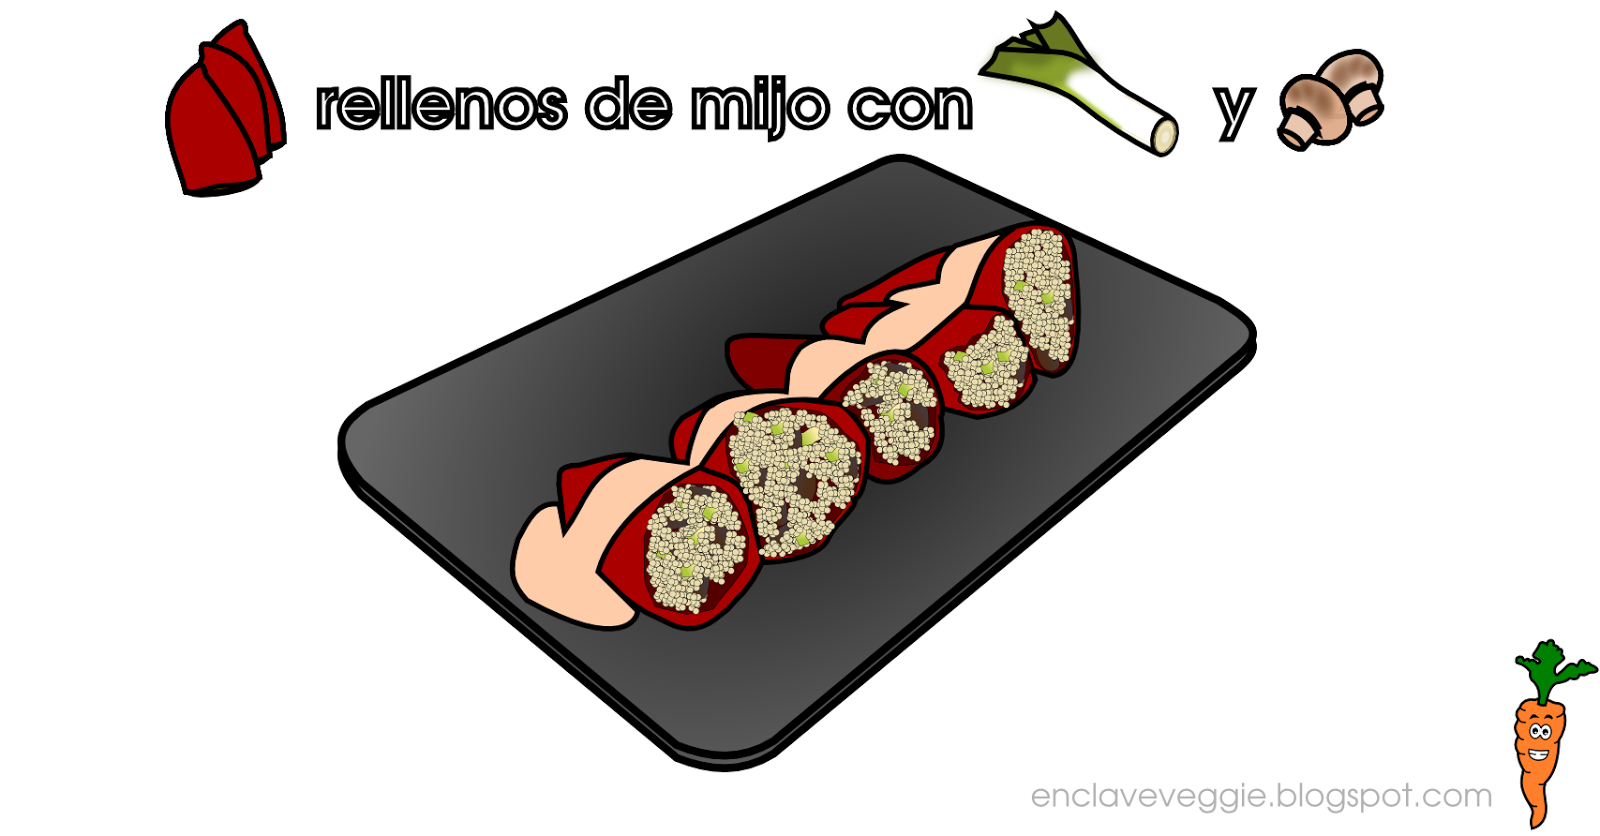 http://enclaveveggie.blogspot.com.es/2014/12/pimientos-de-piquillos-rellenos-de-mijo.html